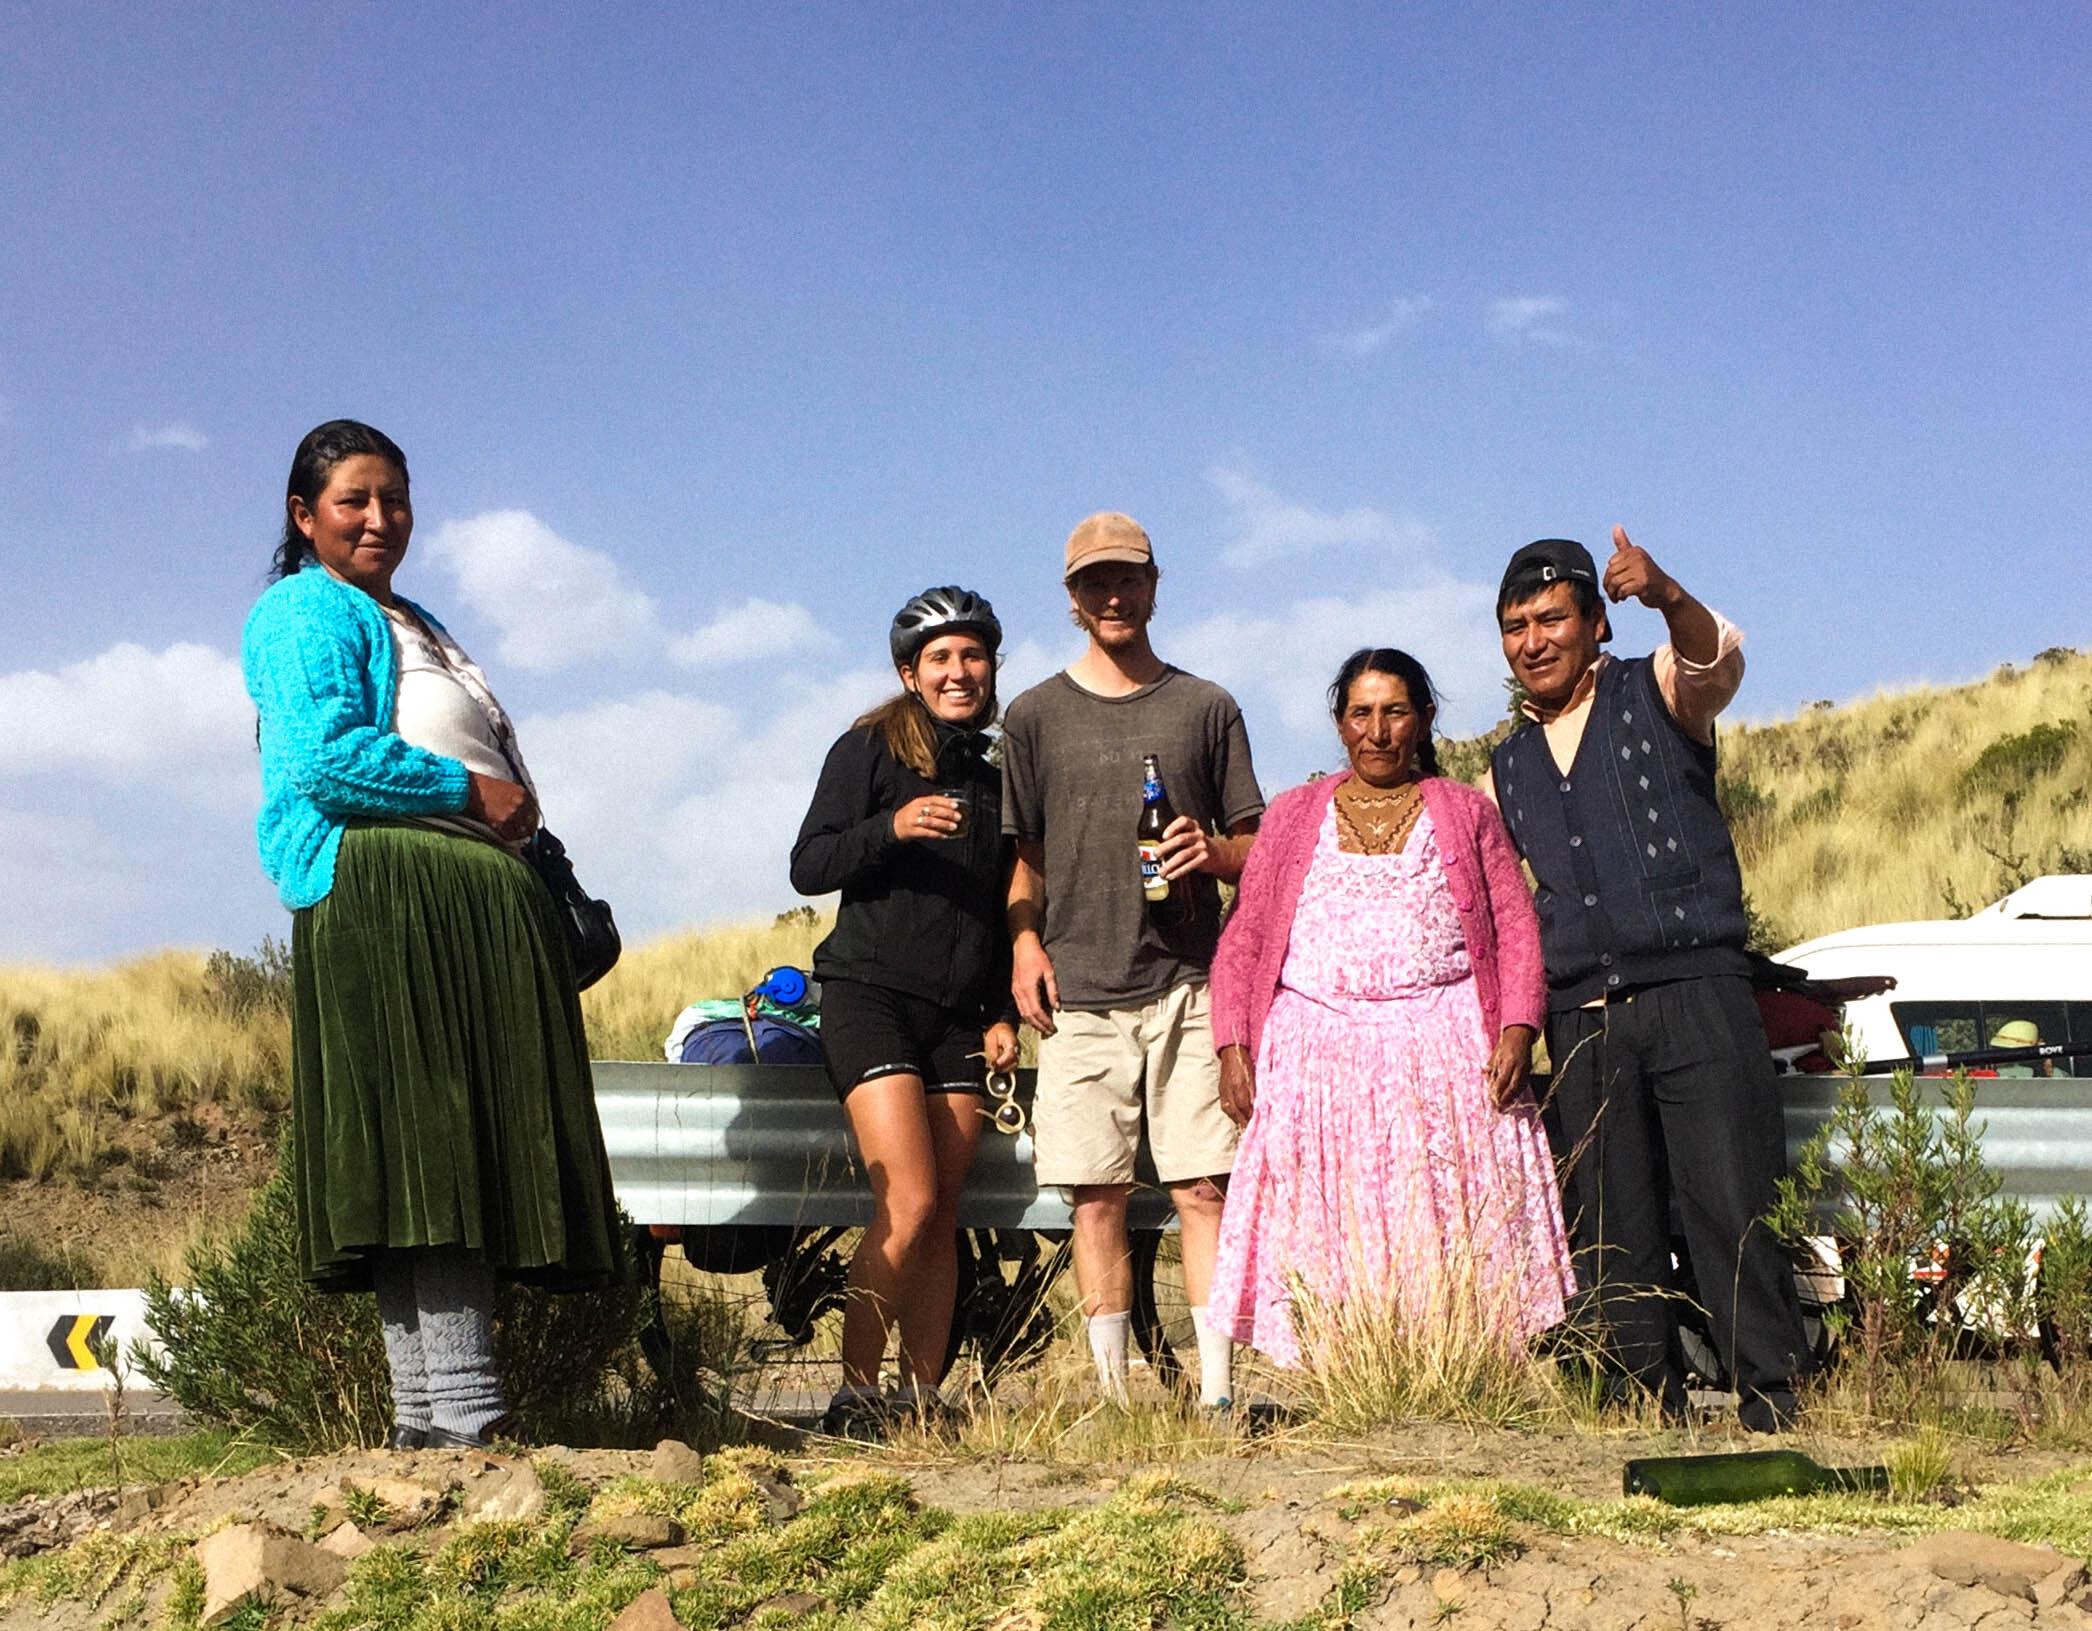 Ruby and her boyfriend Nick with friends in Peru, 2019